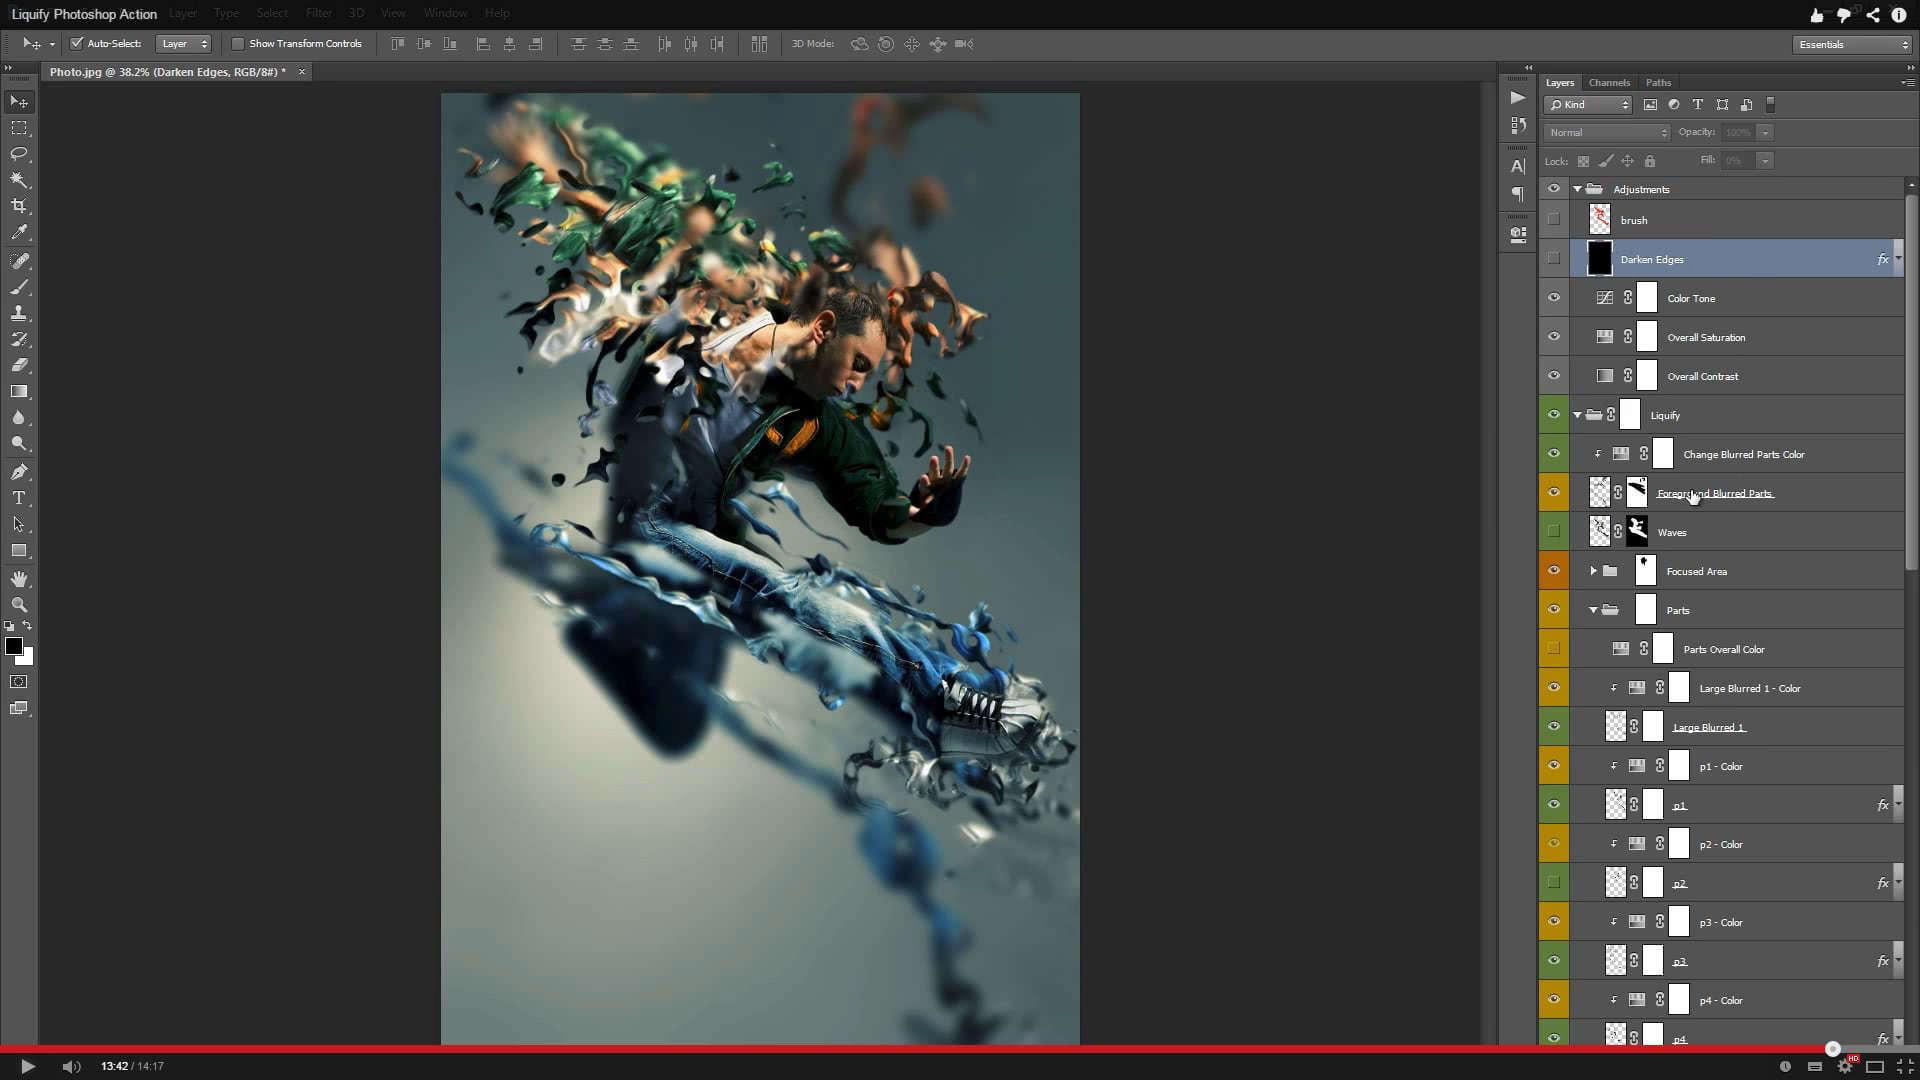 Liquify Photoshop Action - 1